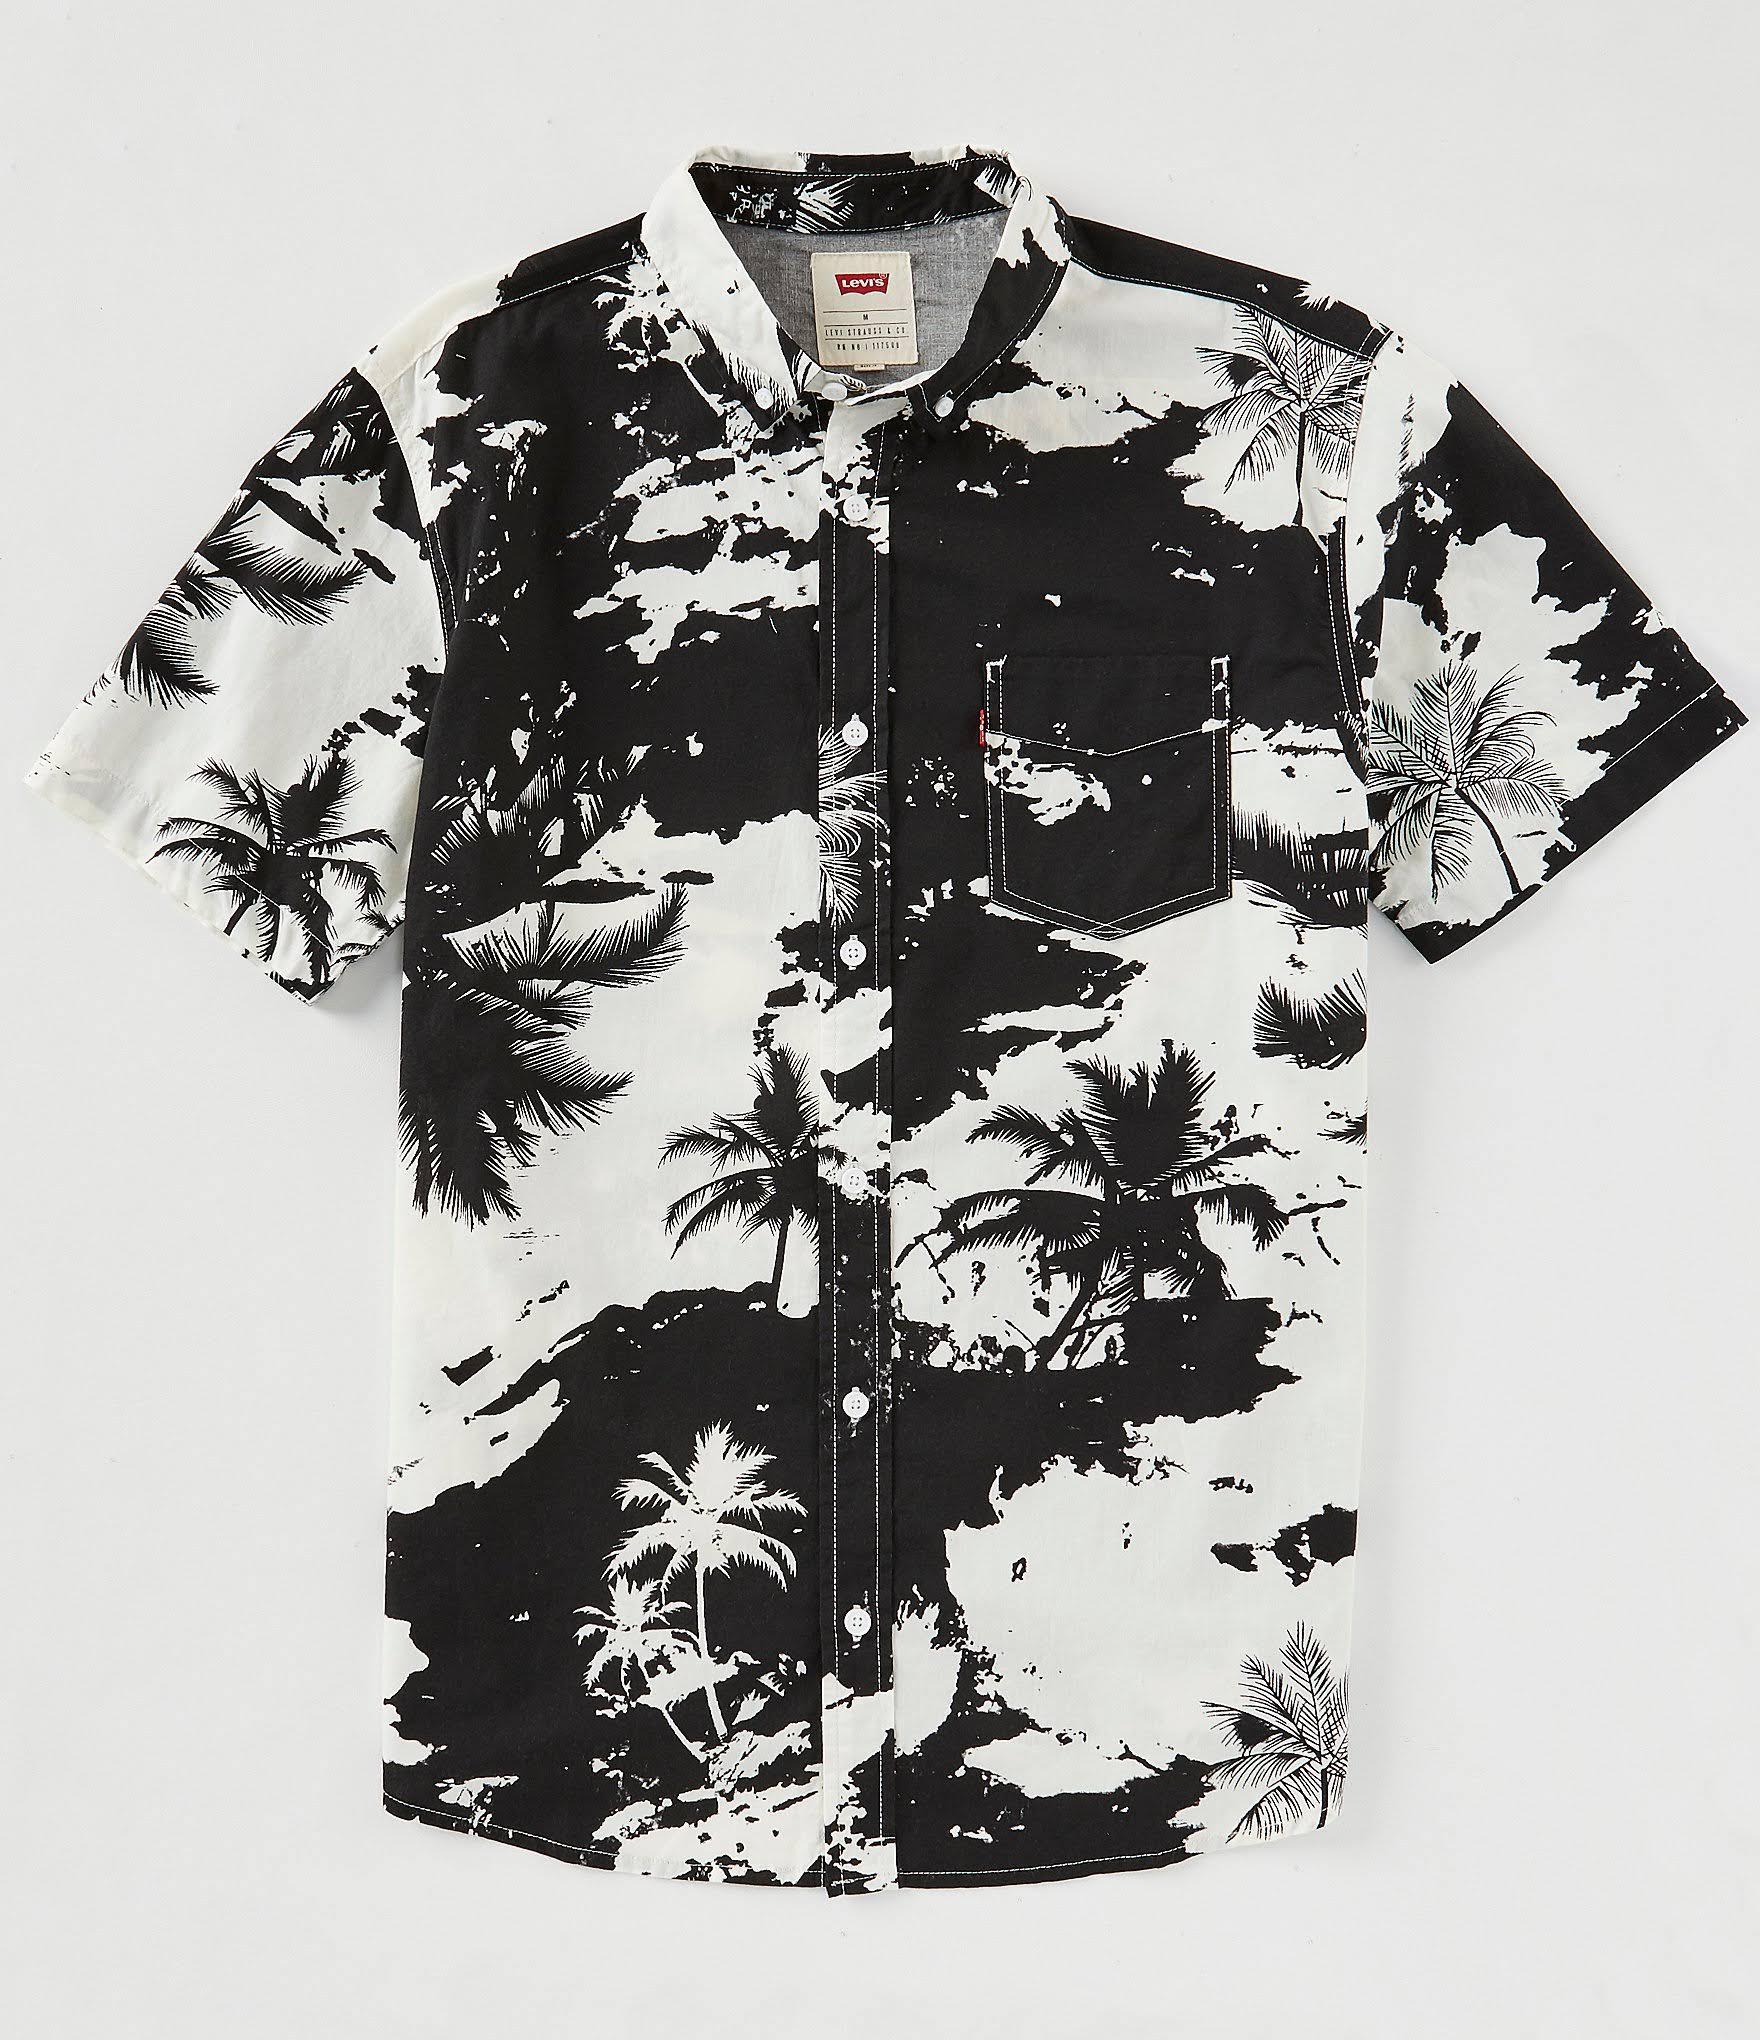 Con Para Mozell S Negro Camisa Palma Estampado De Hombre Popelina Levi's w0xq16